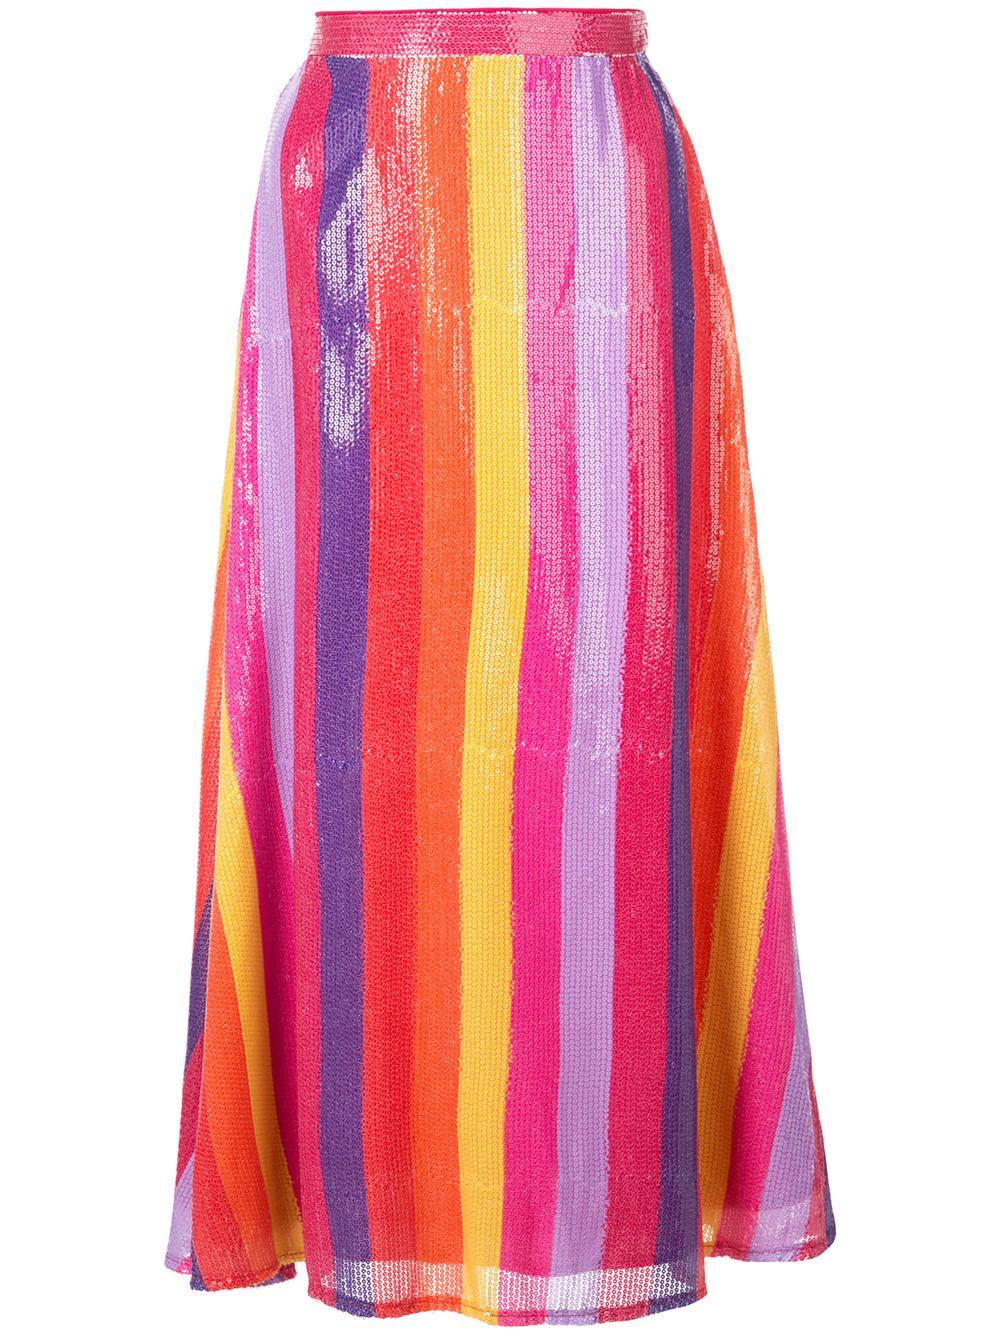 Penelope Striped Skirt Item # OR0130